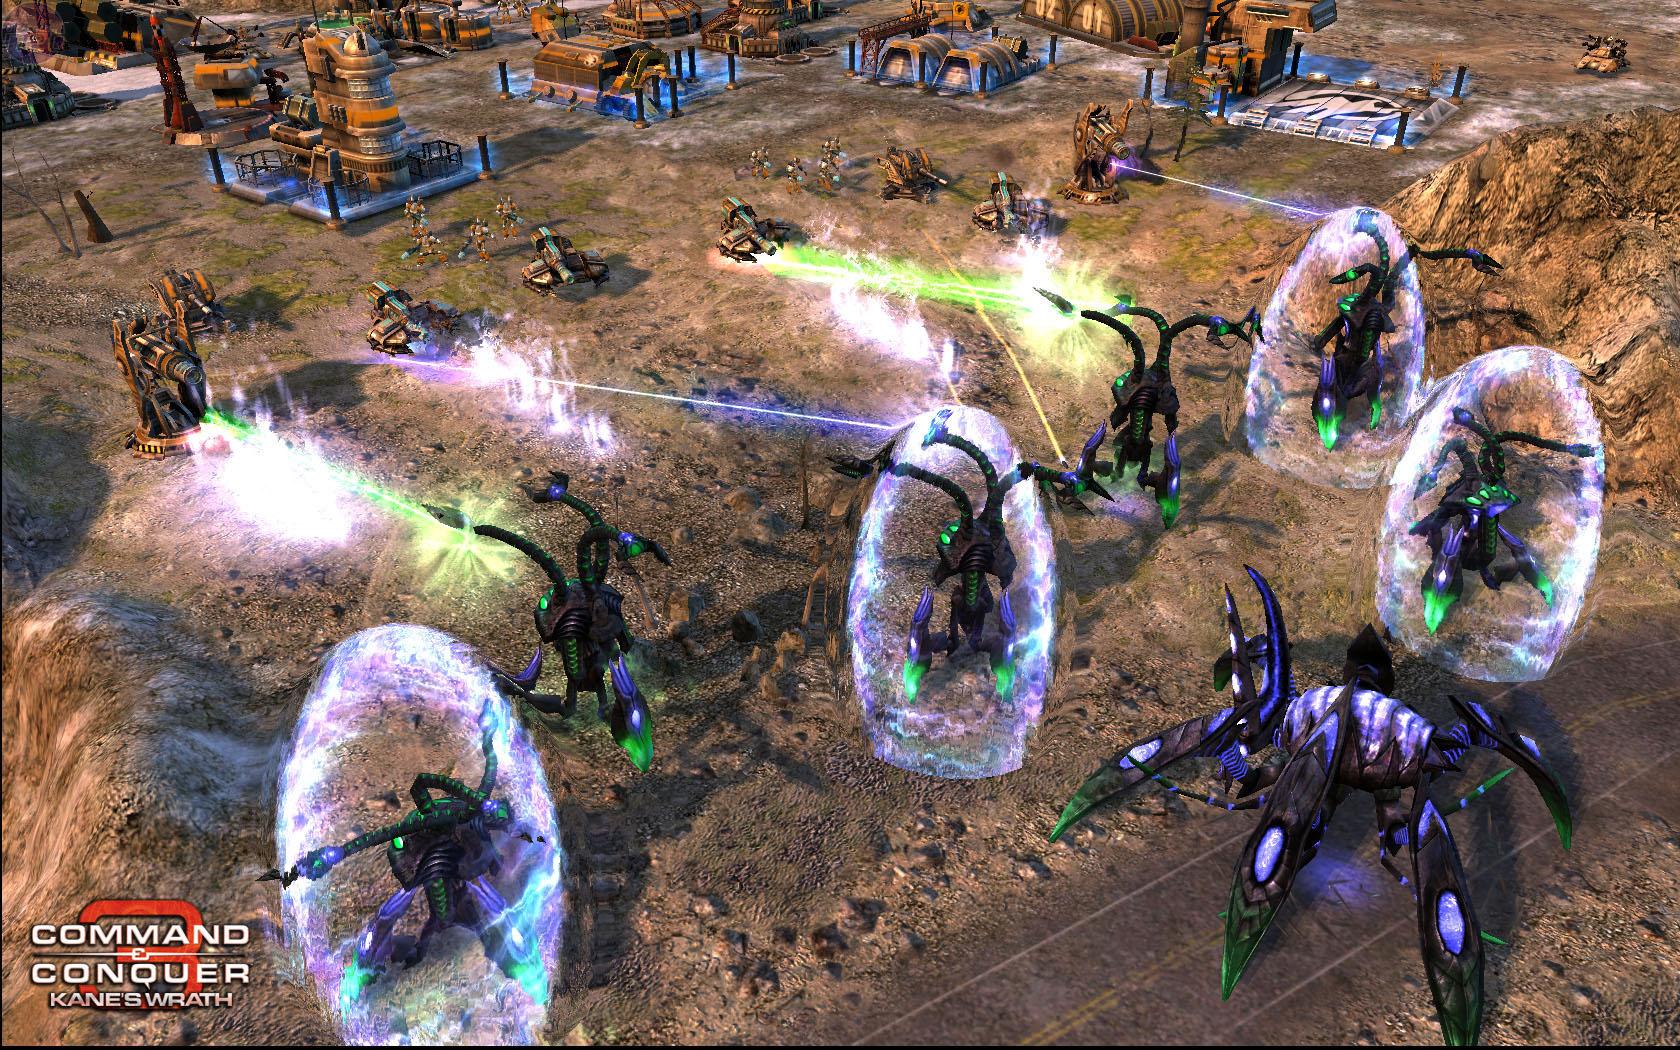 Mad catz micro ctrli - взгляни на ios-игры по-новому